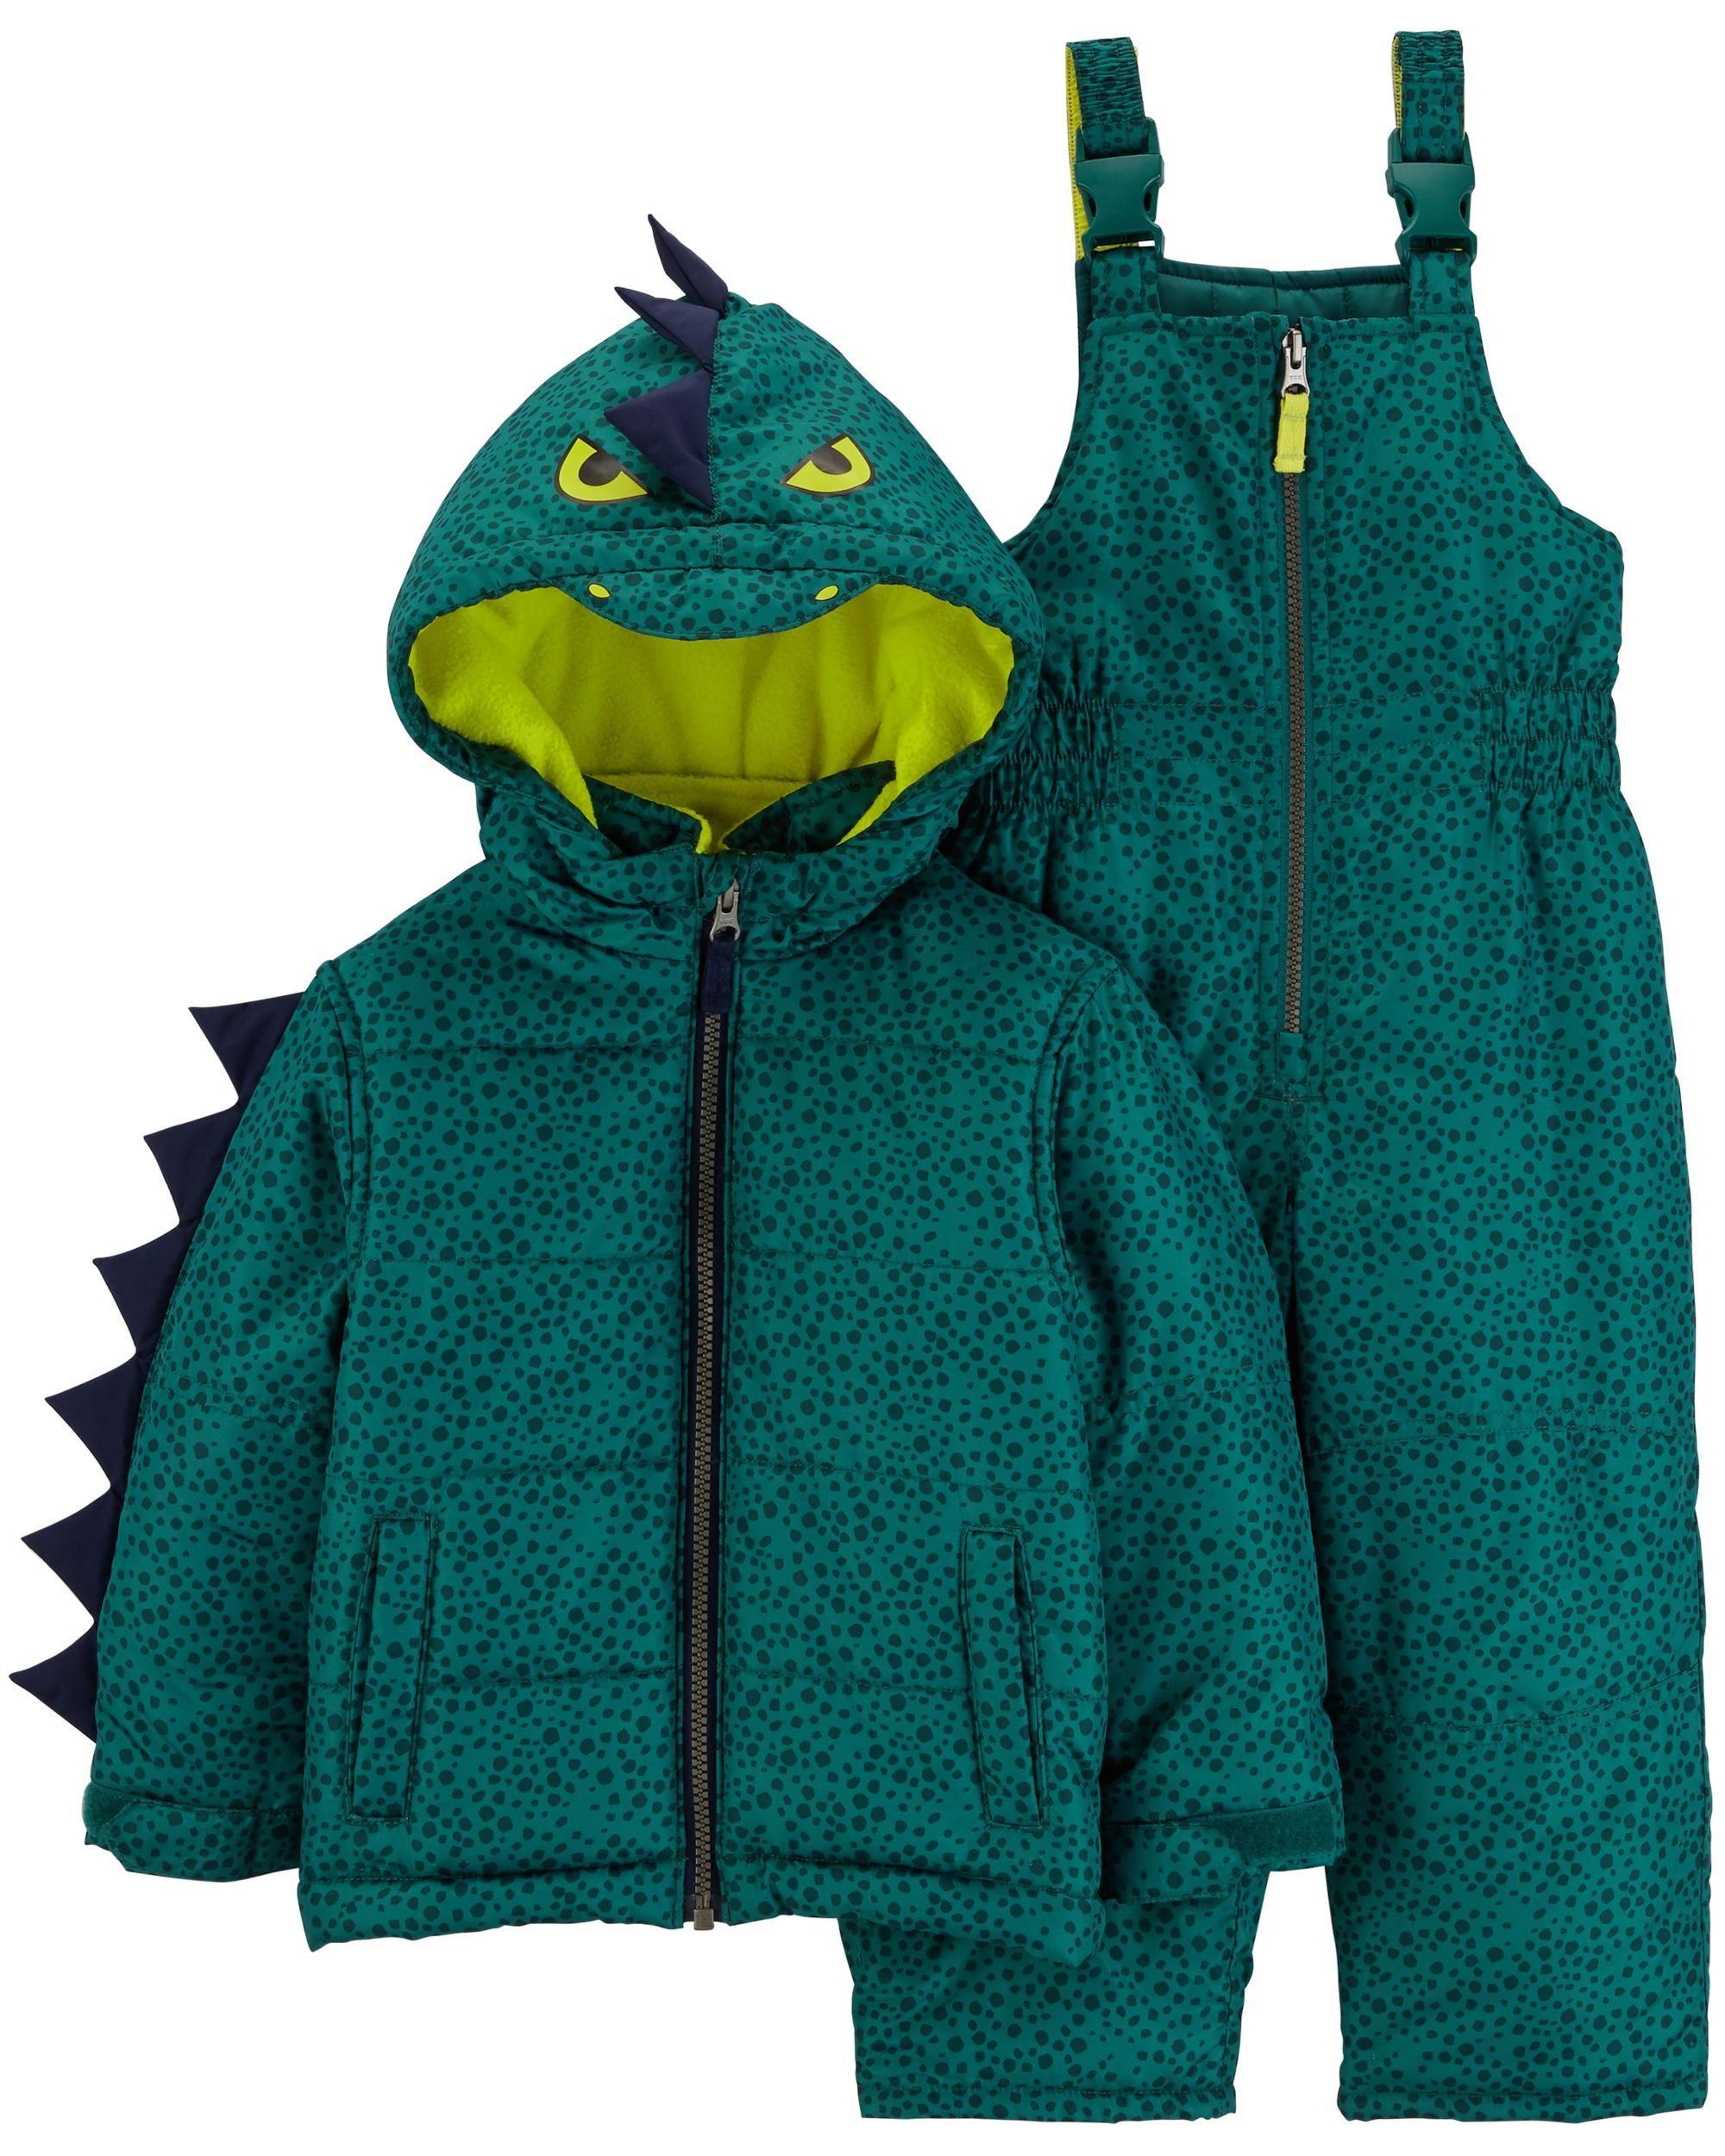 2 Piece Dinosaur Snowsuit Set Boy Outerwear Boys Jacket Toddler Snowsuit [ 2500 x 2000 Pixel ]